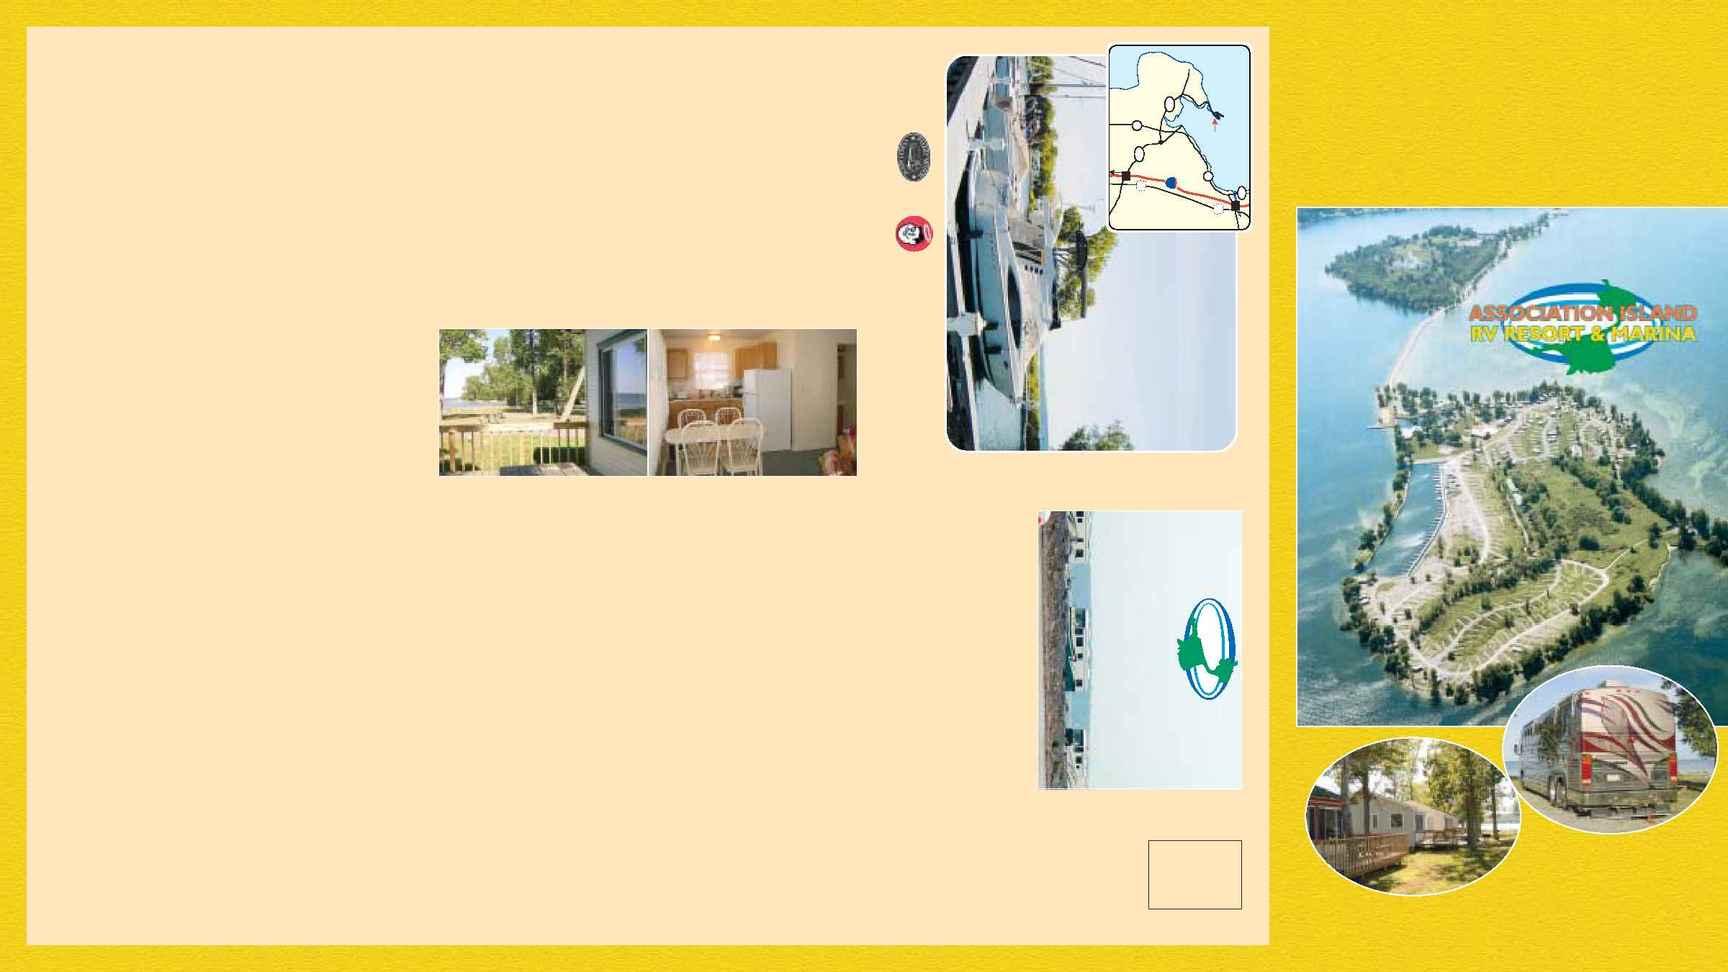 Association Island RV Resort and Marina - AIRM Brochure